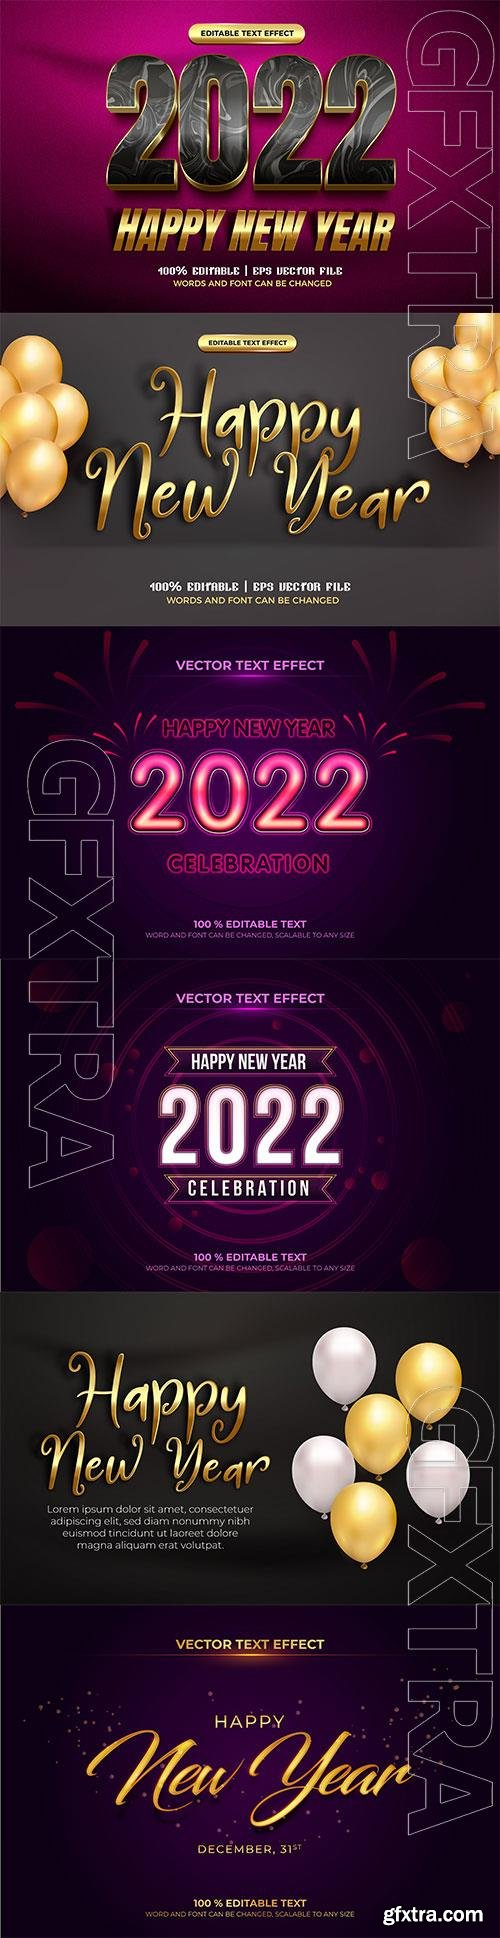 Happy new year 2022 luxury black gold 3d editable text effect premium vector